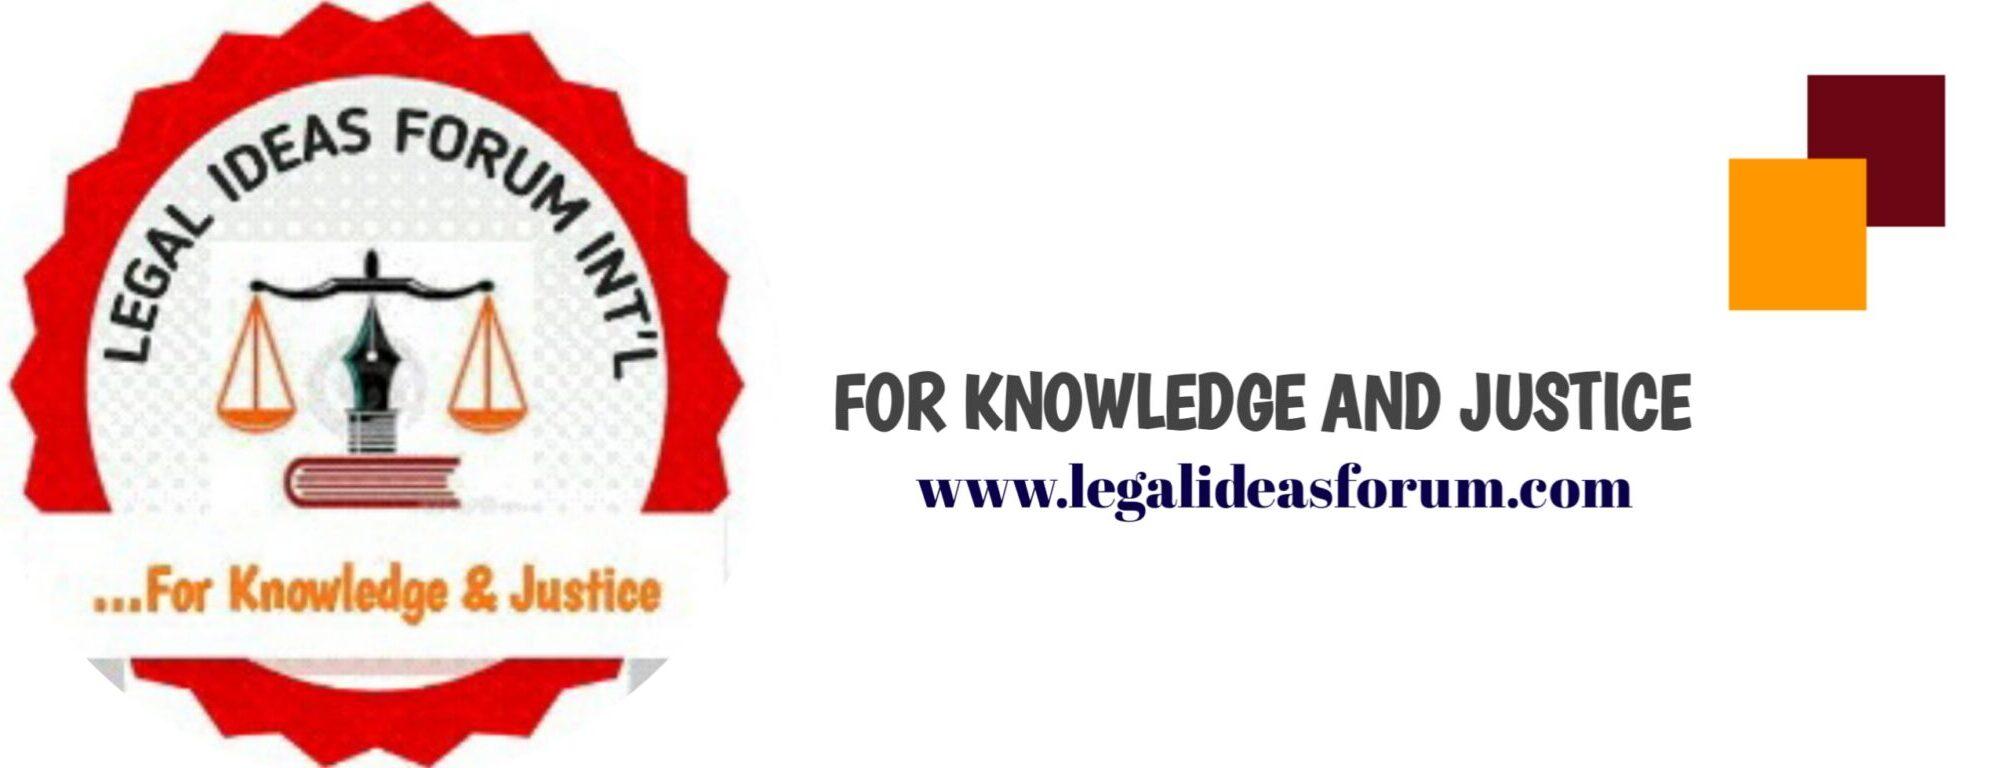 LEGAL IDEAS FORUM